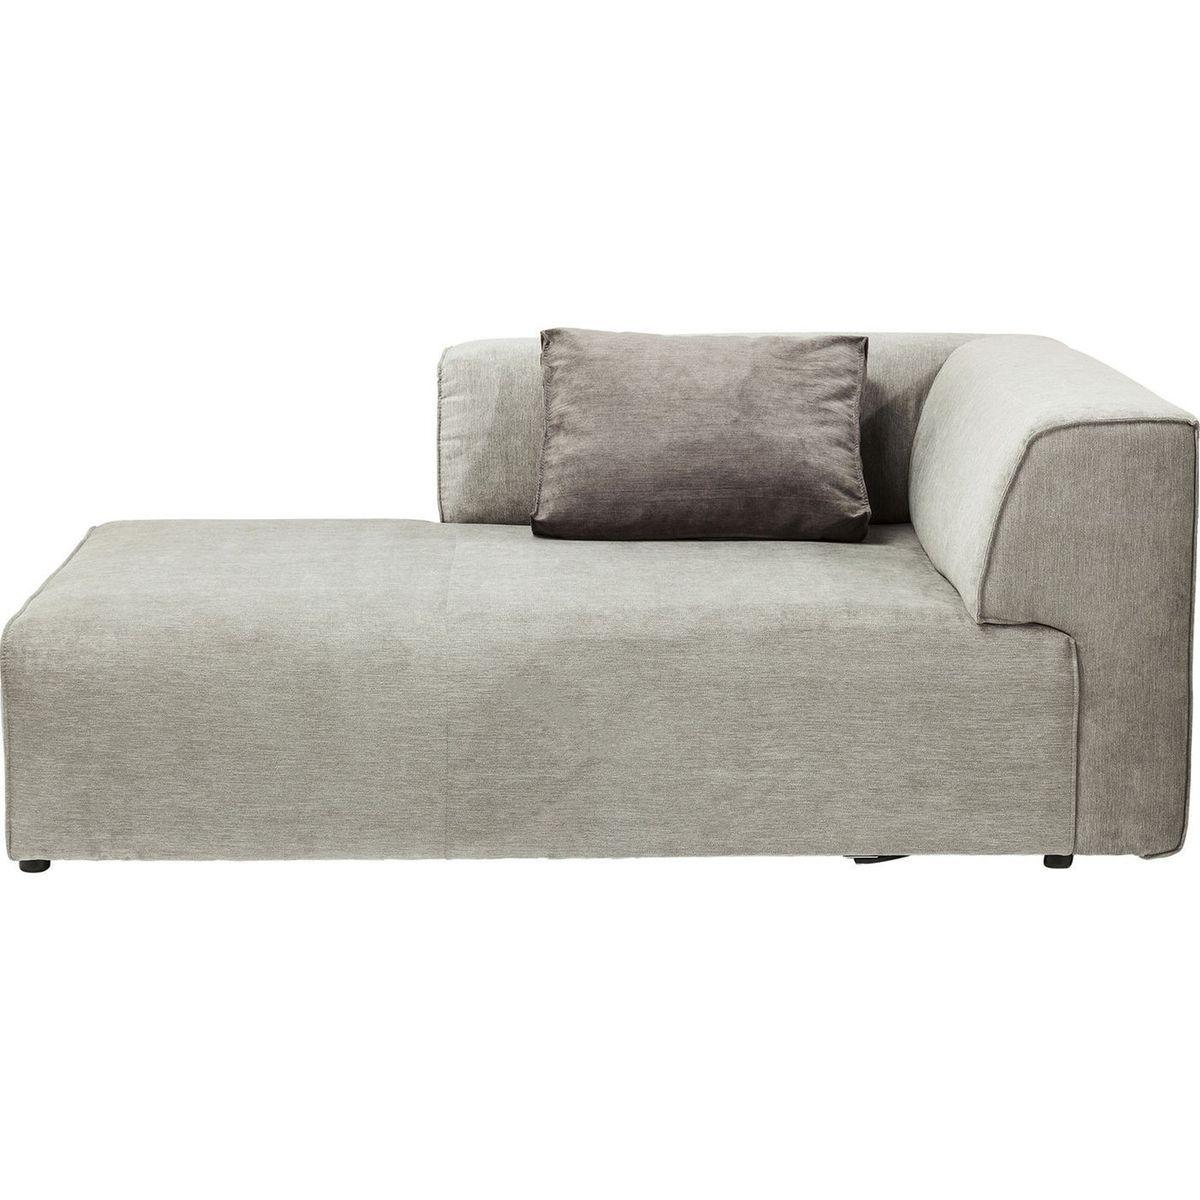 Canapé méridien d'angle gauche Infinity gris Kare Design